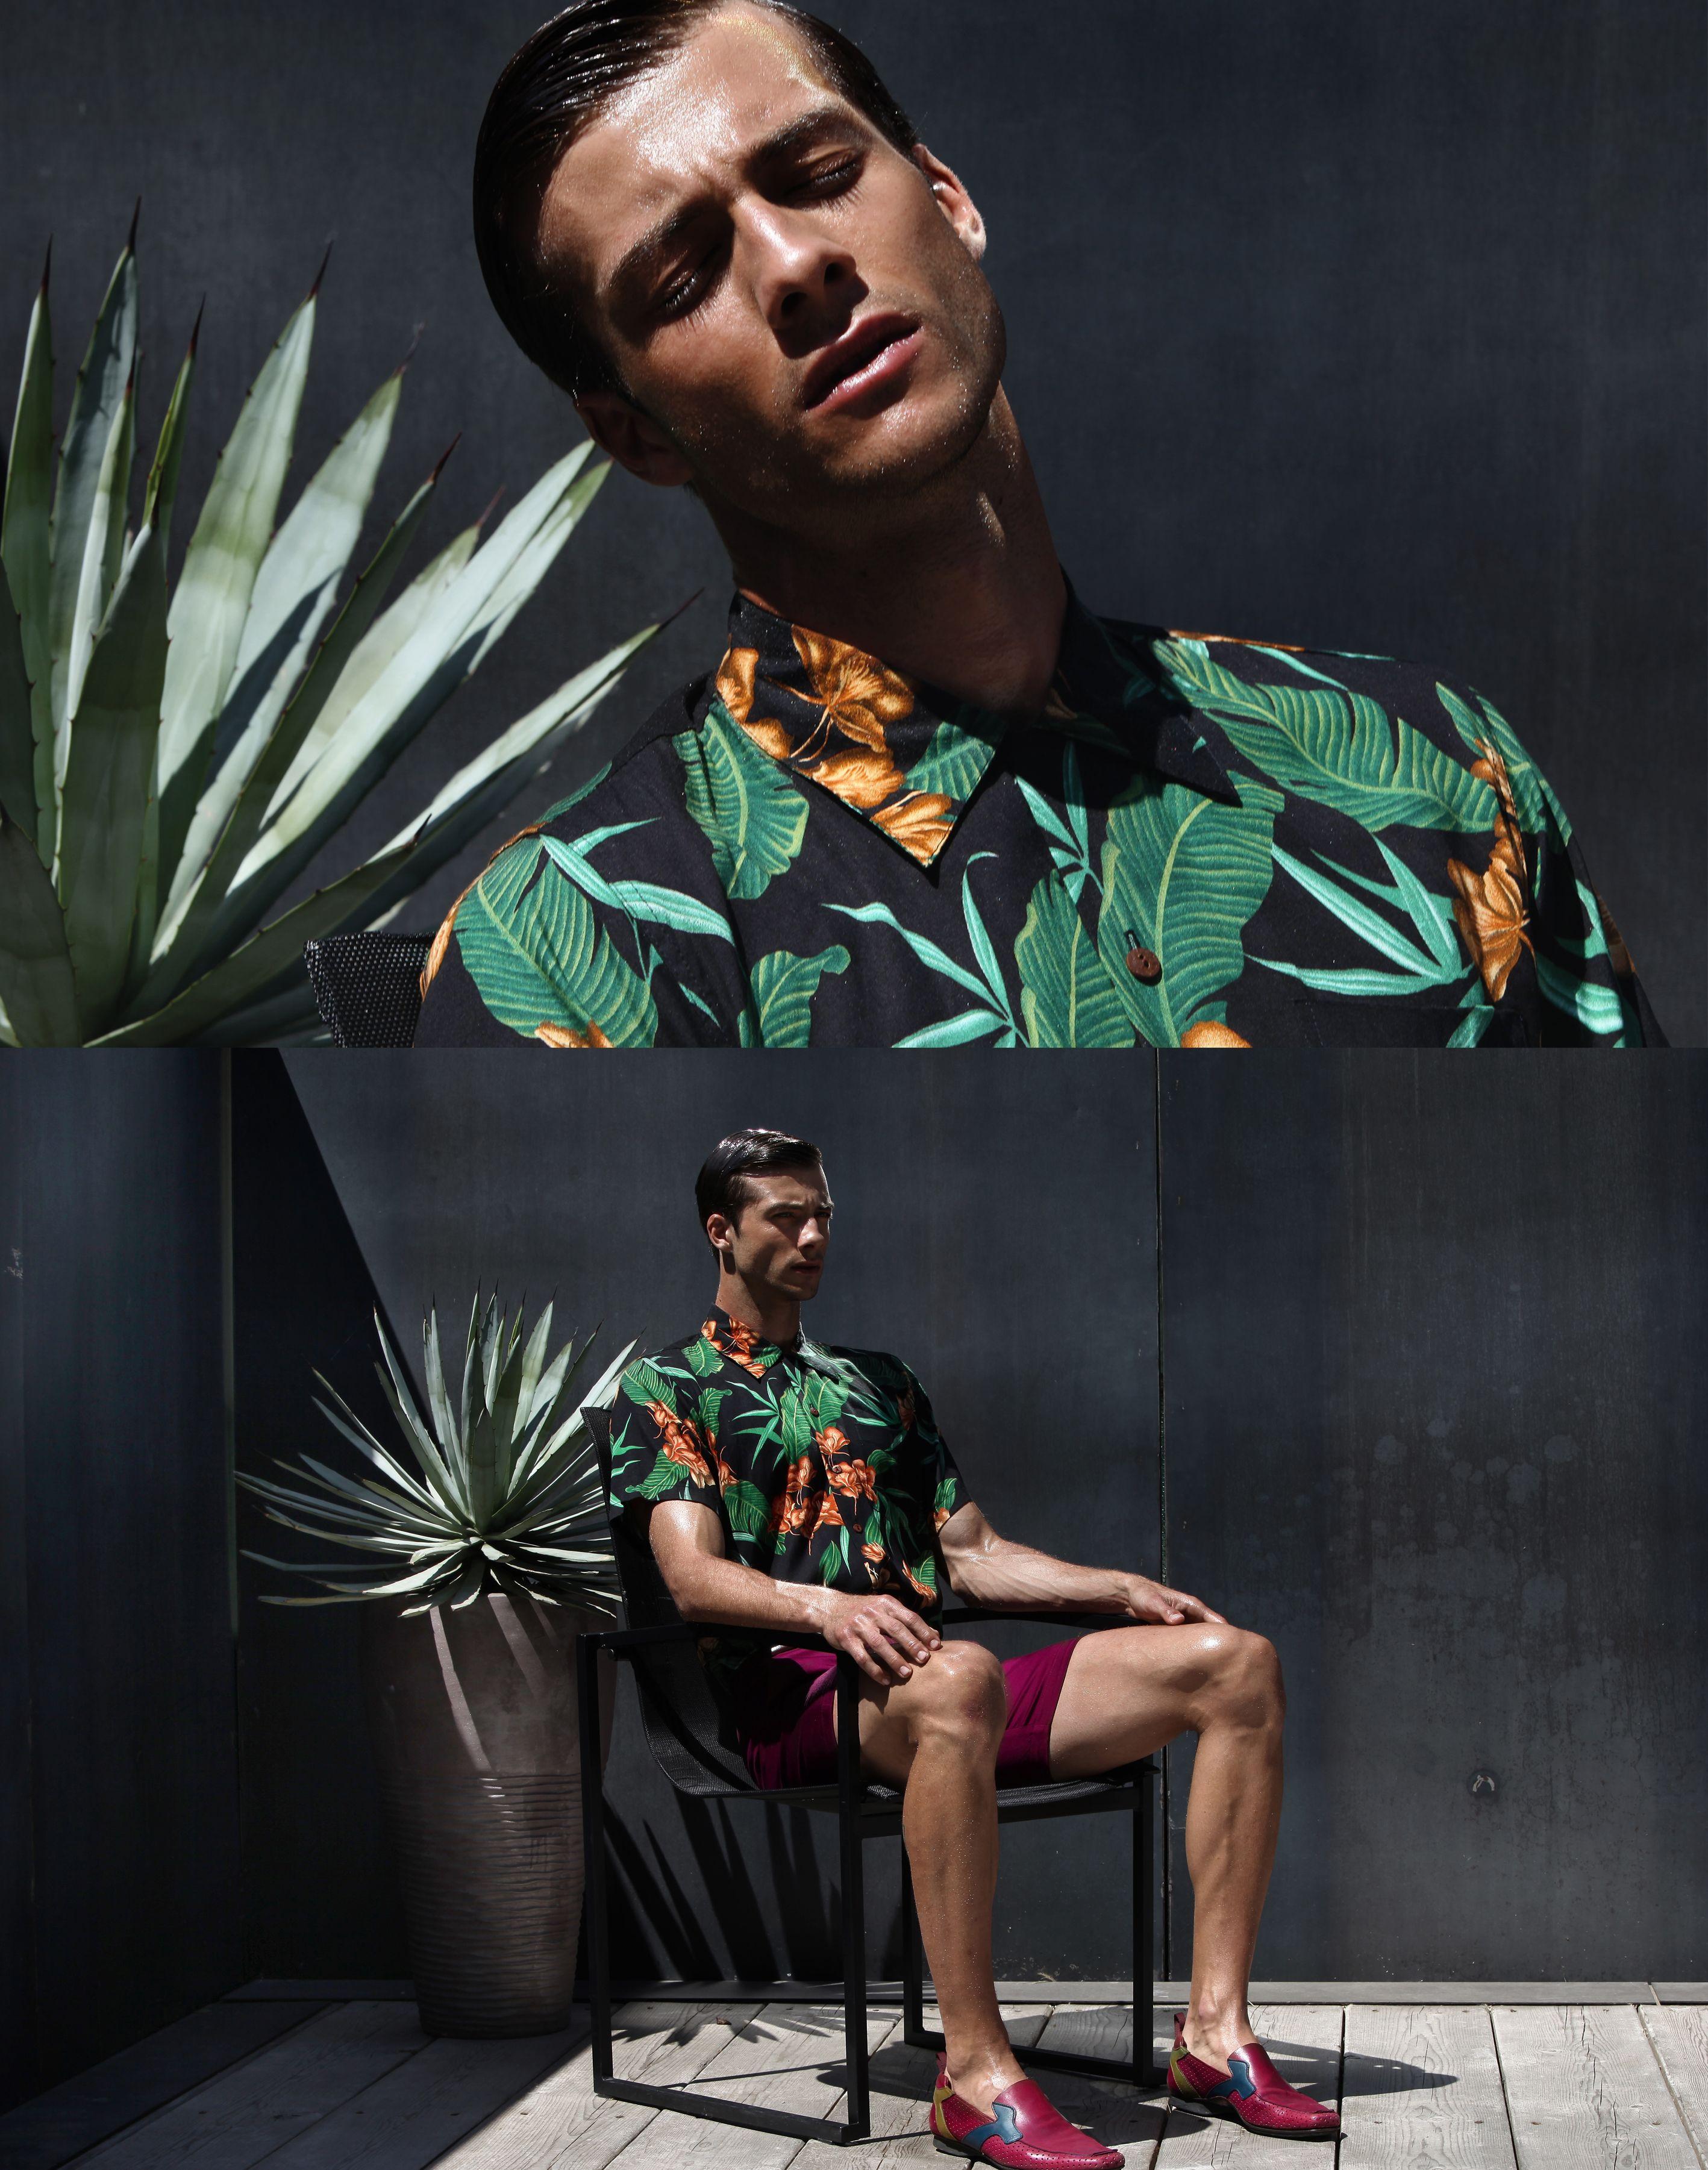 Image Result For Vetements Photoshoot Kotva Lux Pinterest Suqma Harper Shirt Grey L